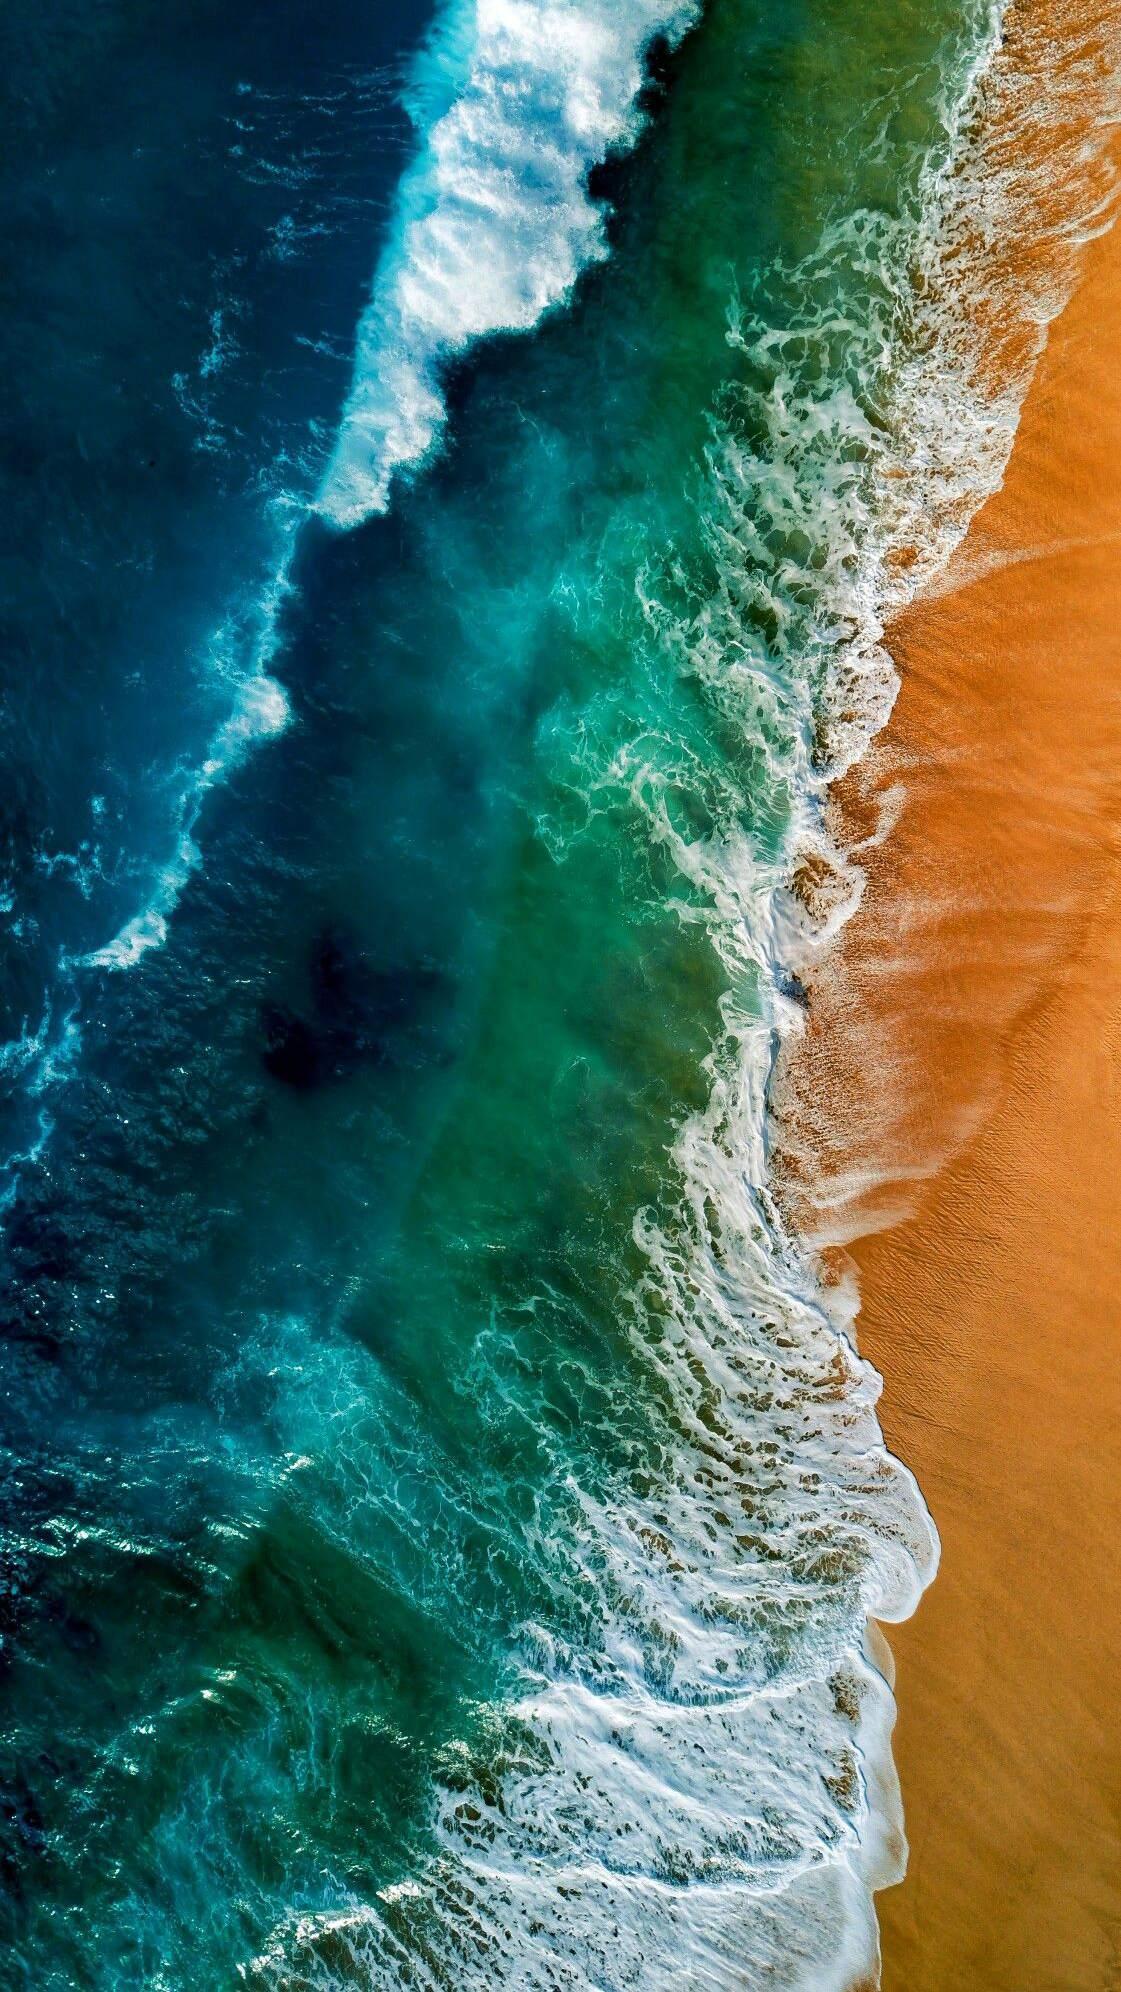 Beach Ocean Waves Sky View iPhone Wallpaper